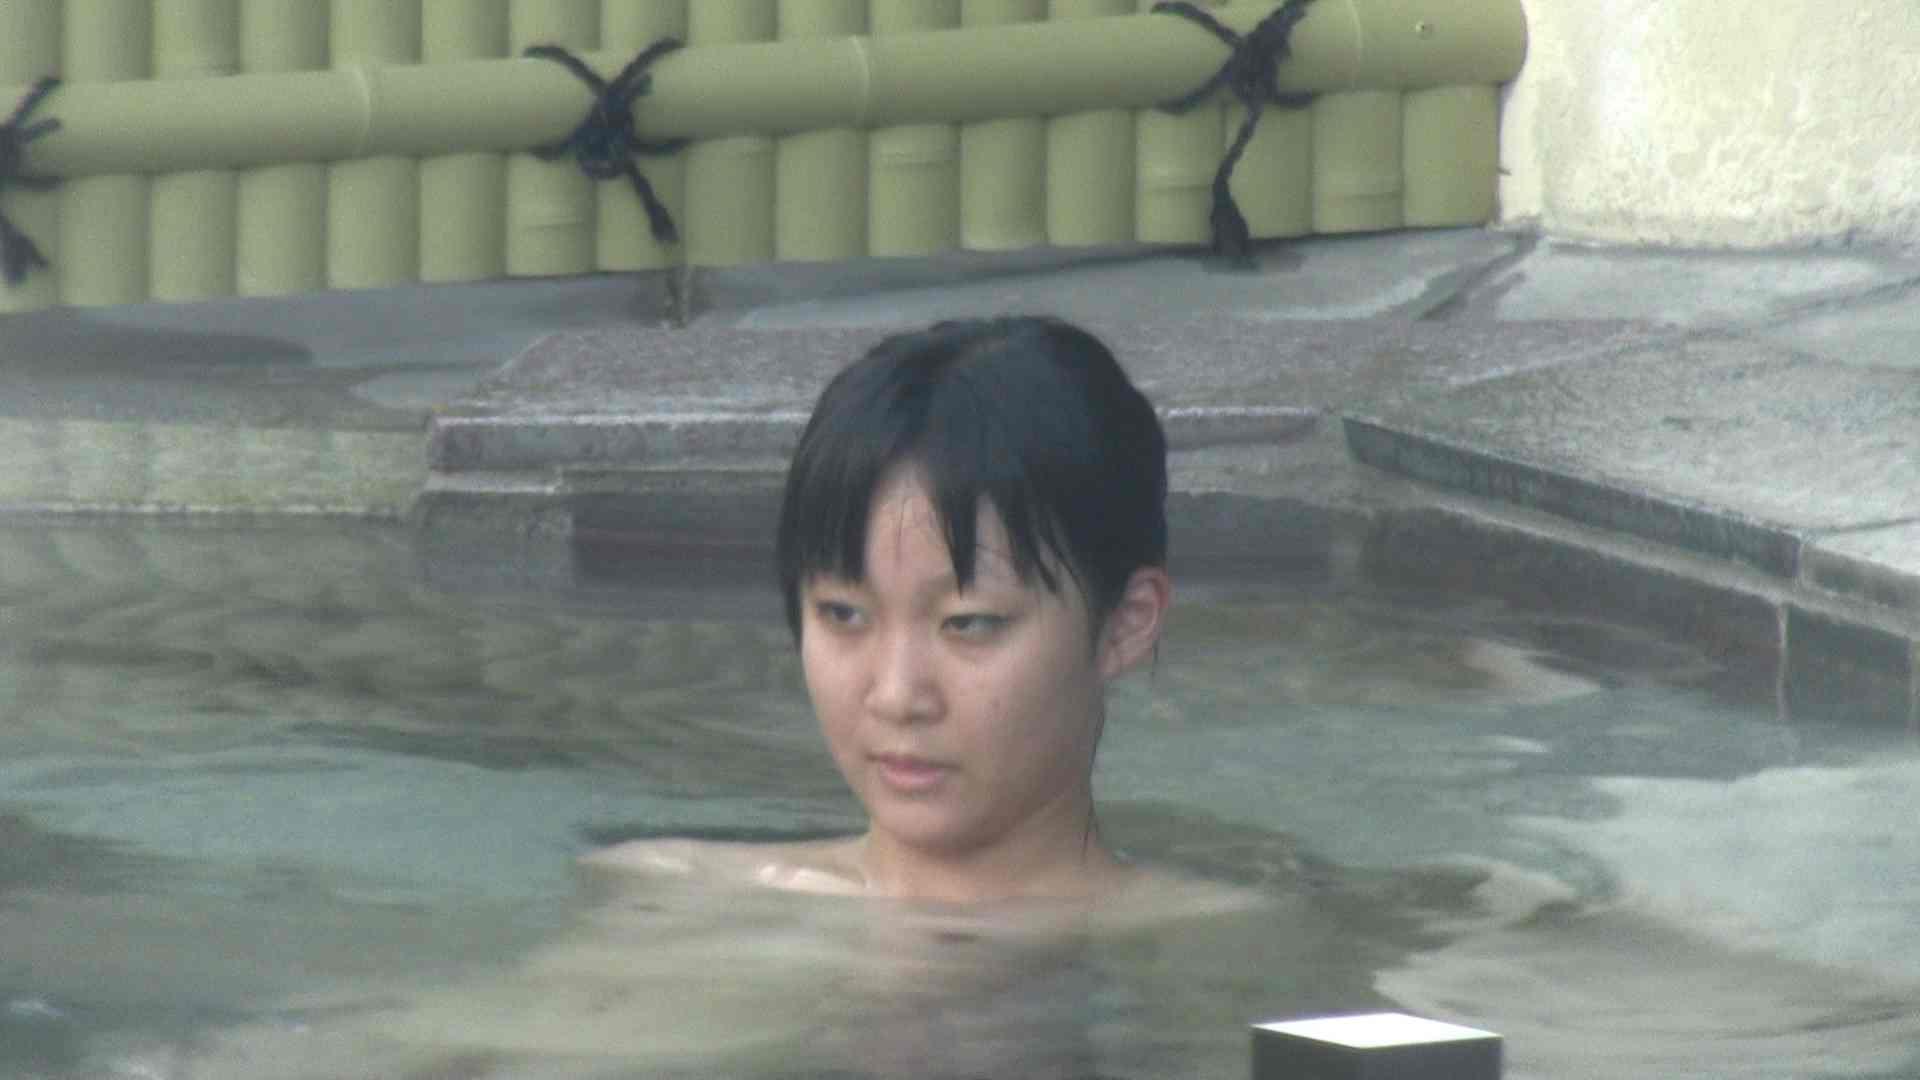 Aquaな露天風呂Vol.196 HなOL | 盗撮  91pic 14